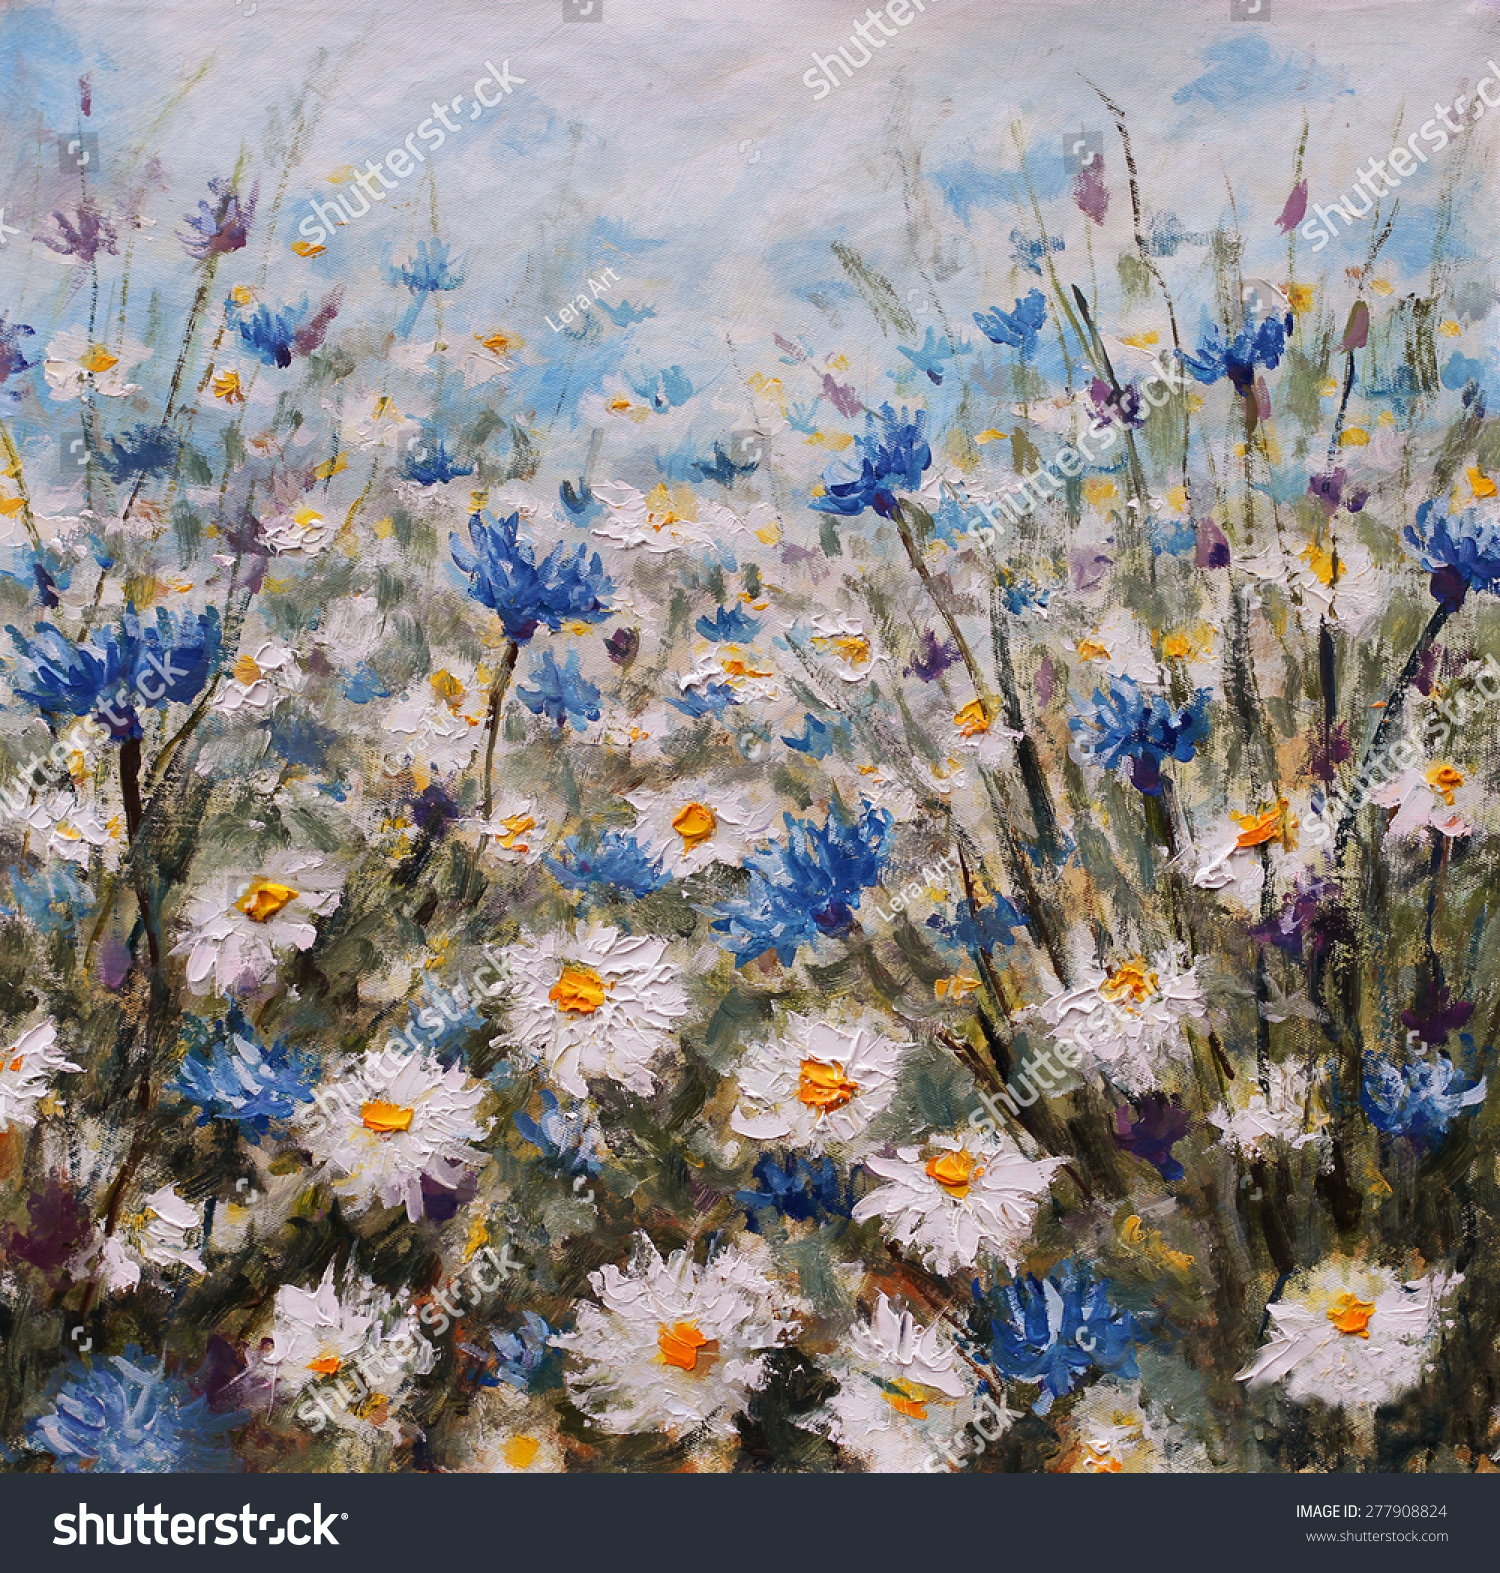 Field White Flowers Glade Cornflowers Daisies Stock Illustration